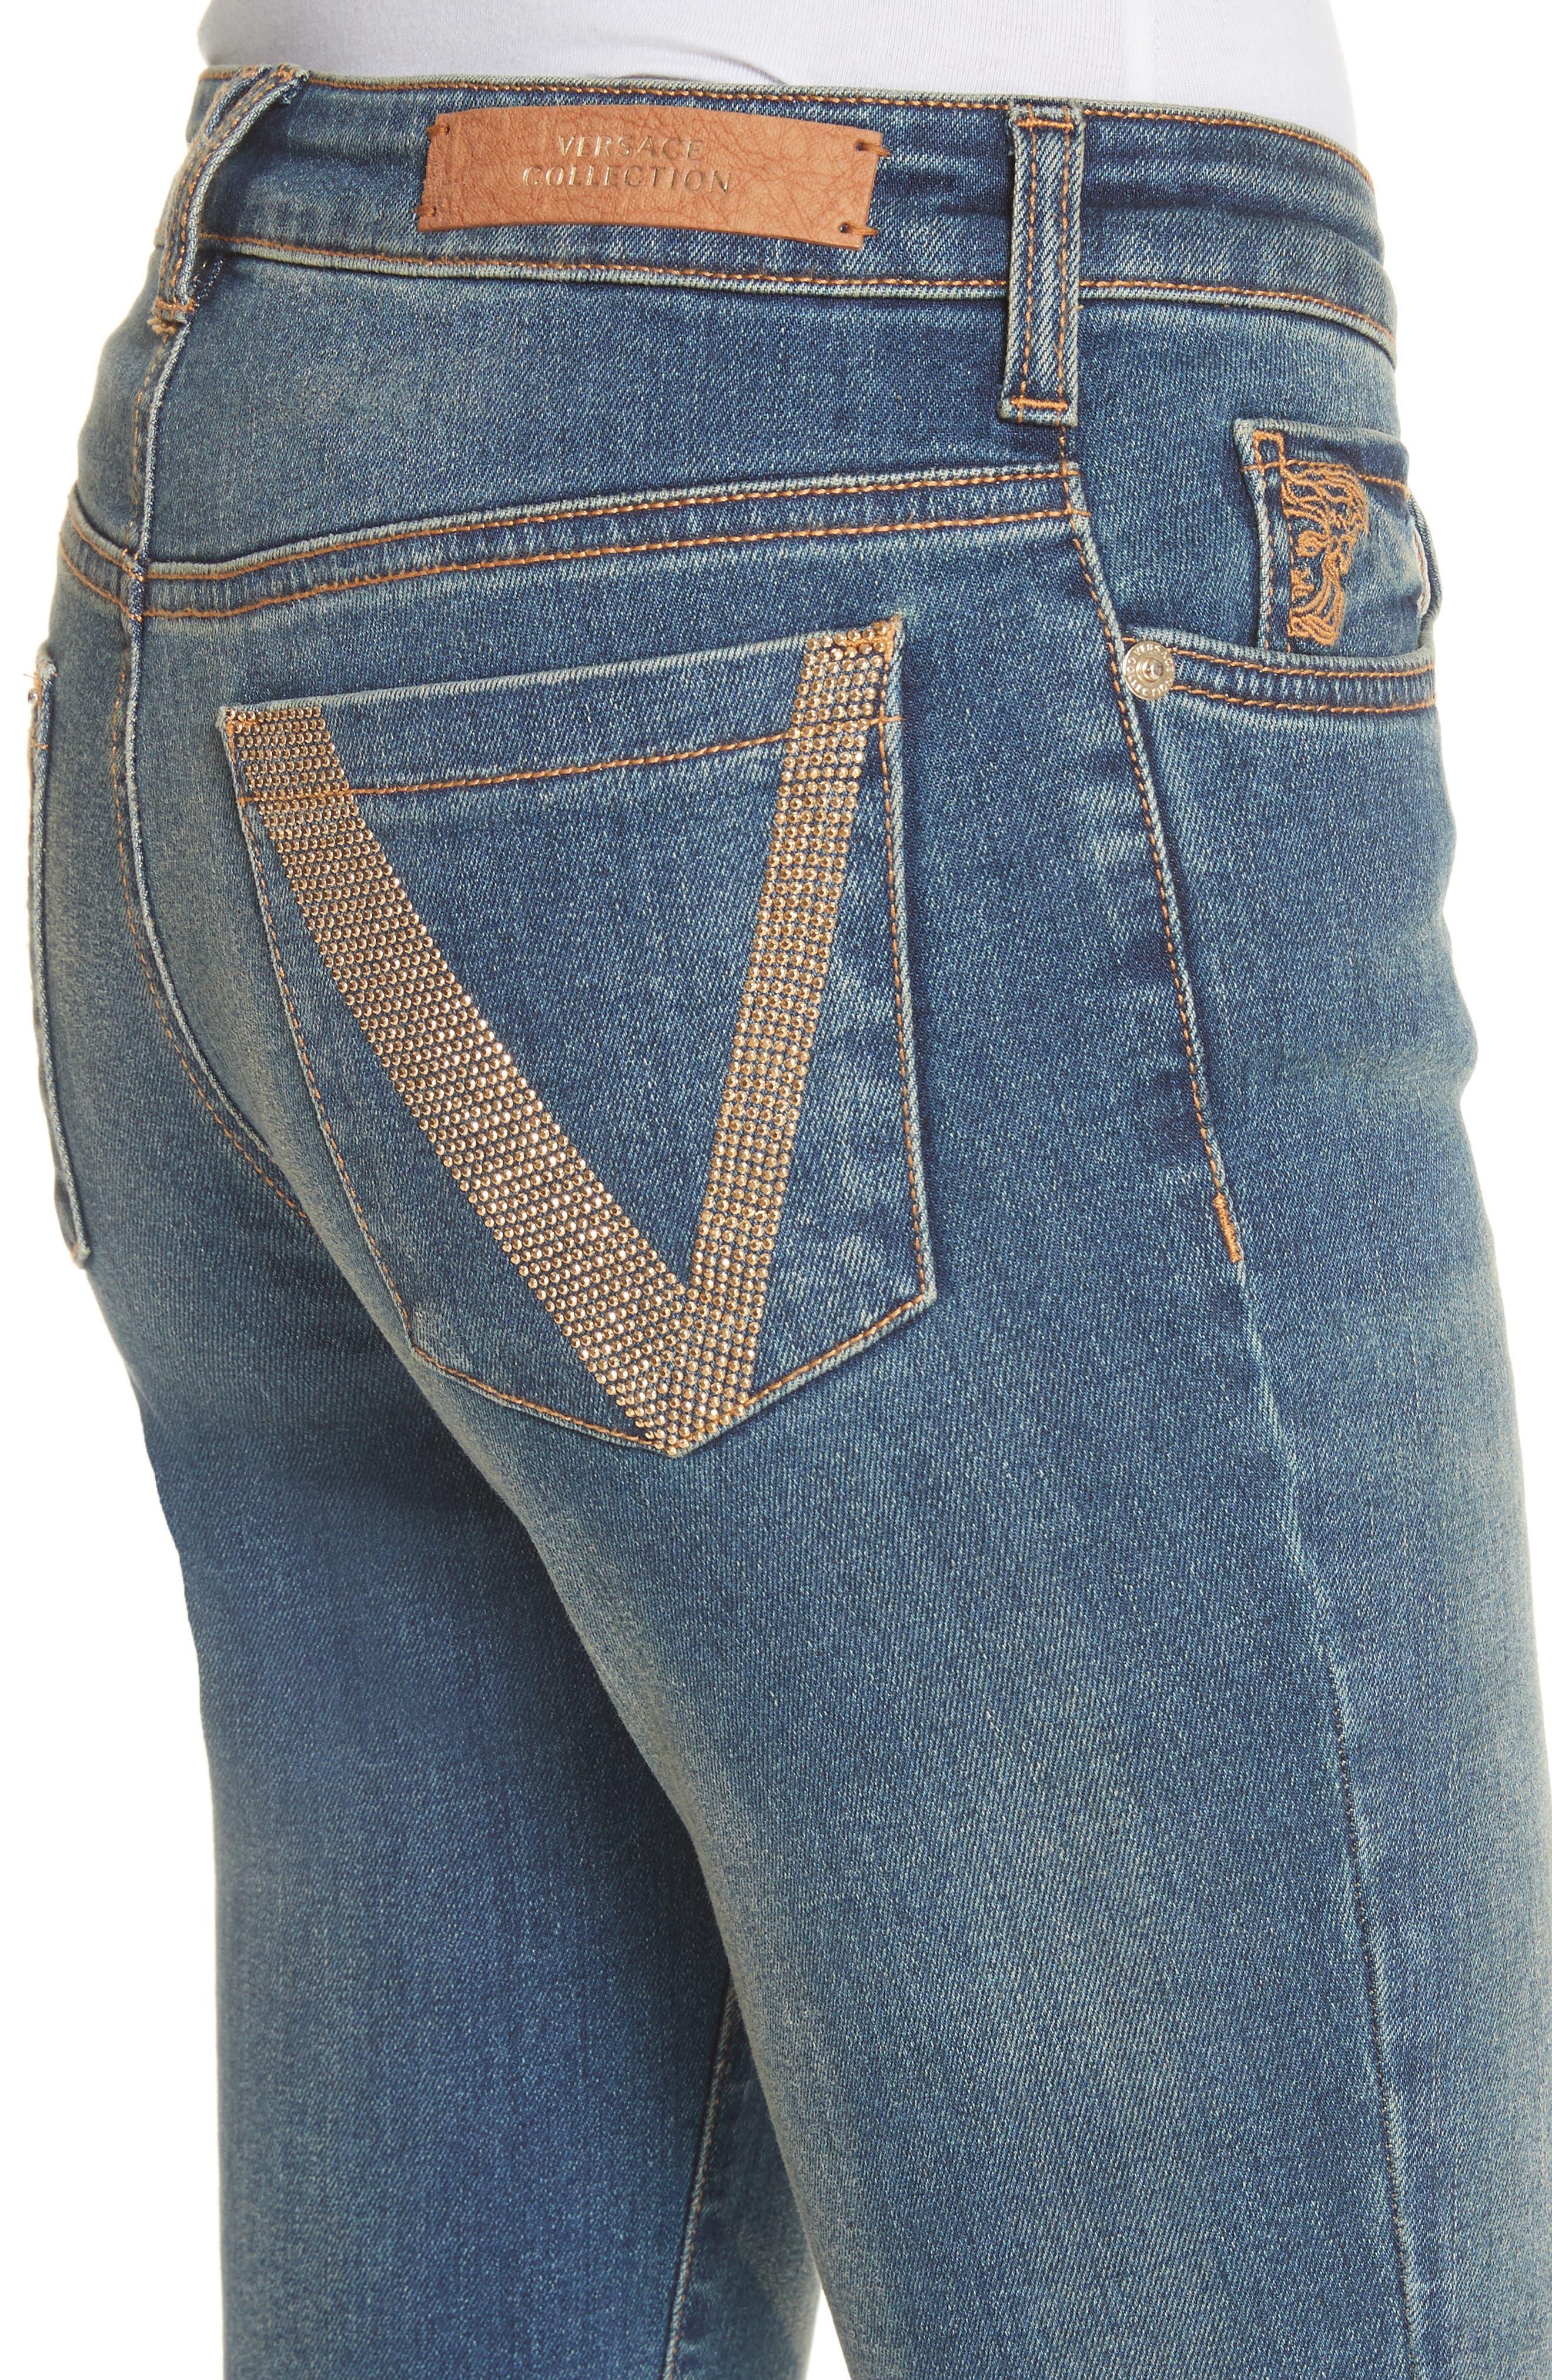 Studded Pocket Skinny Jeans,                             Alternate thumbnail 4, color,                             411